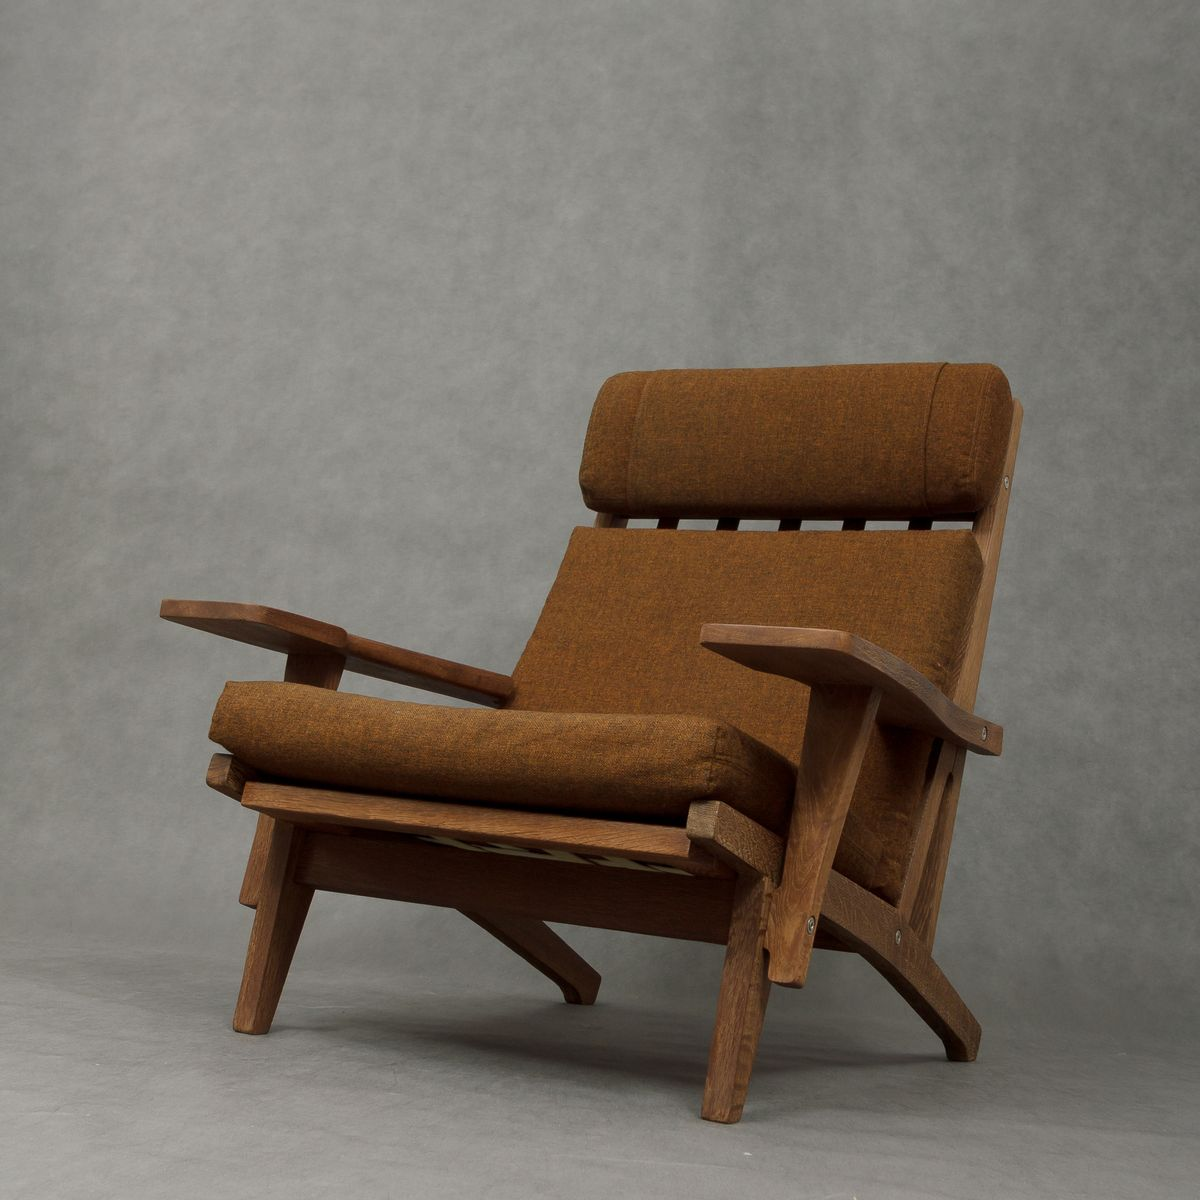 fauteuil ge 375 sabl avec repose pied par hans wegner. Black Bedroom Furniture Sets. Home Design Ideas